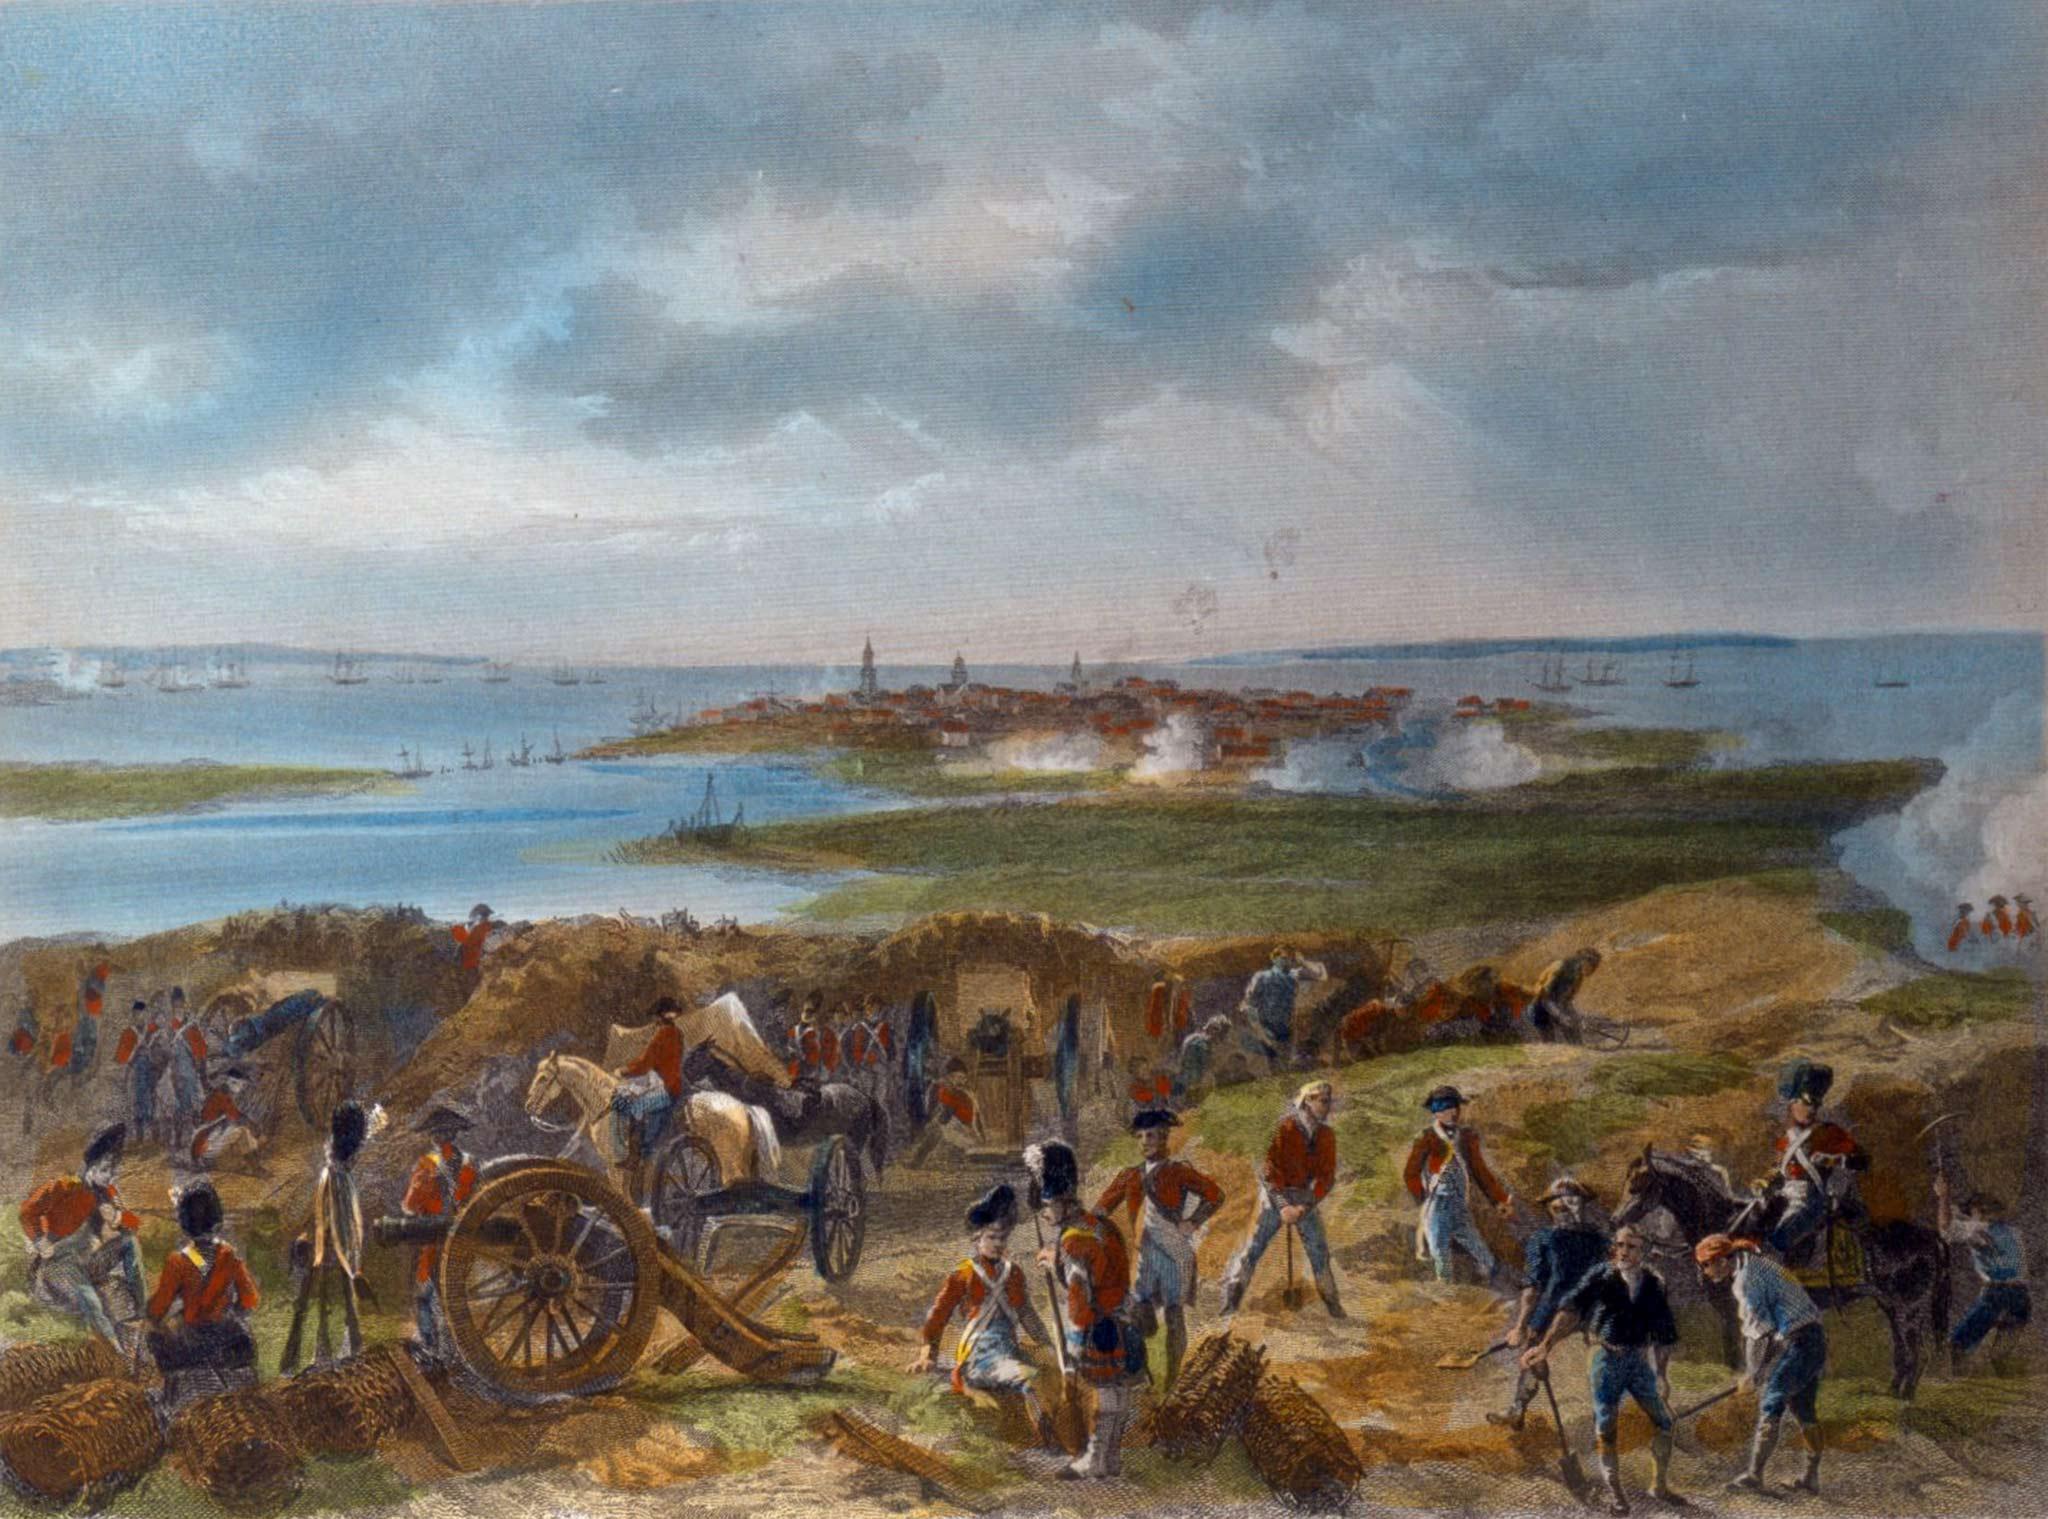 Revolutionary War Siege Lines Walking Tour with Director, Carl P. Borick